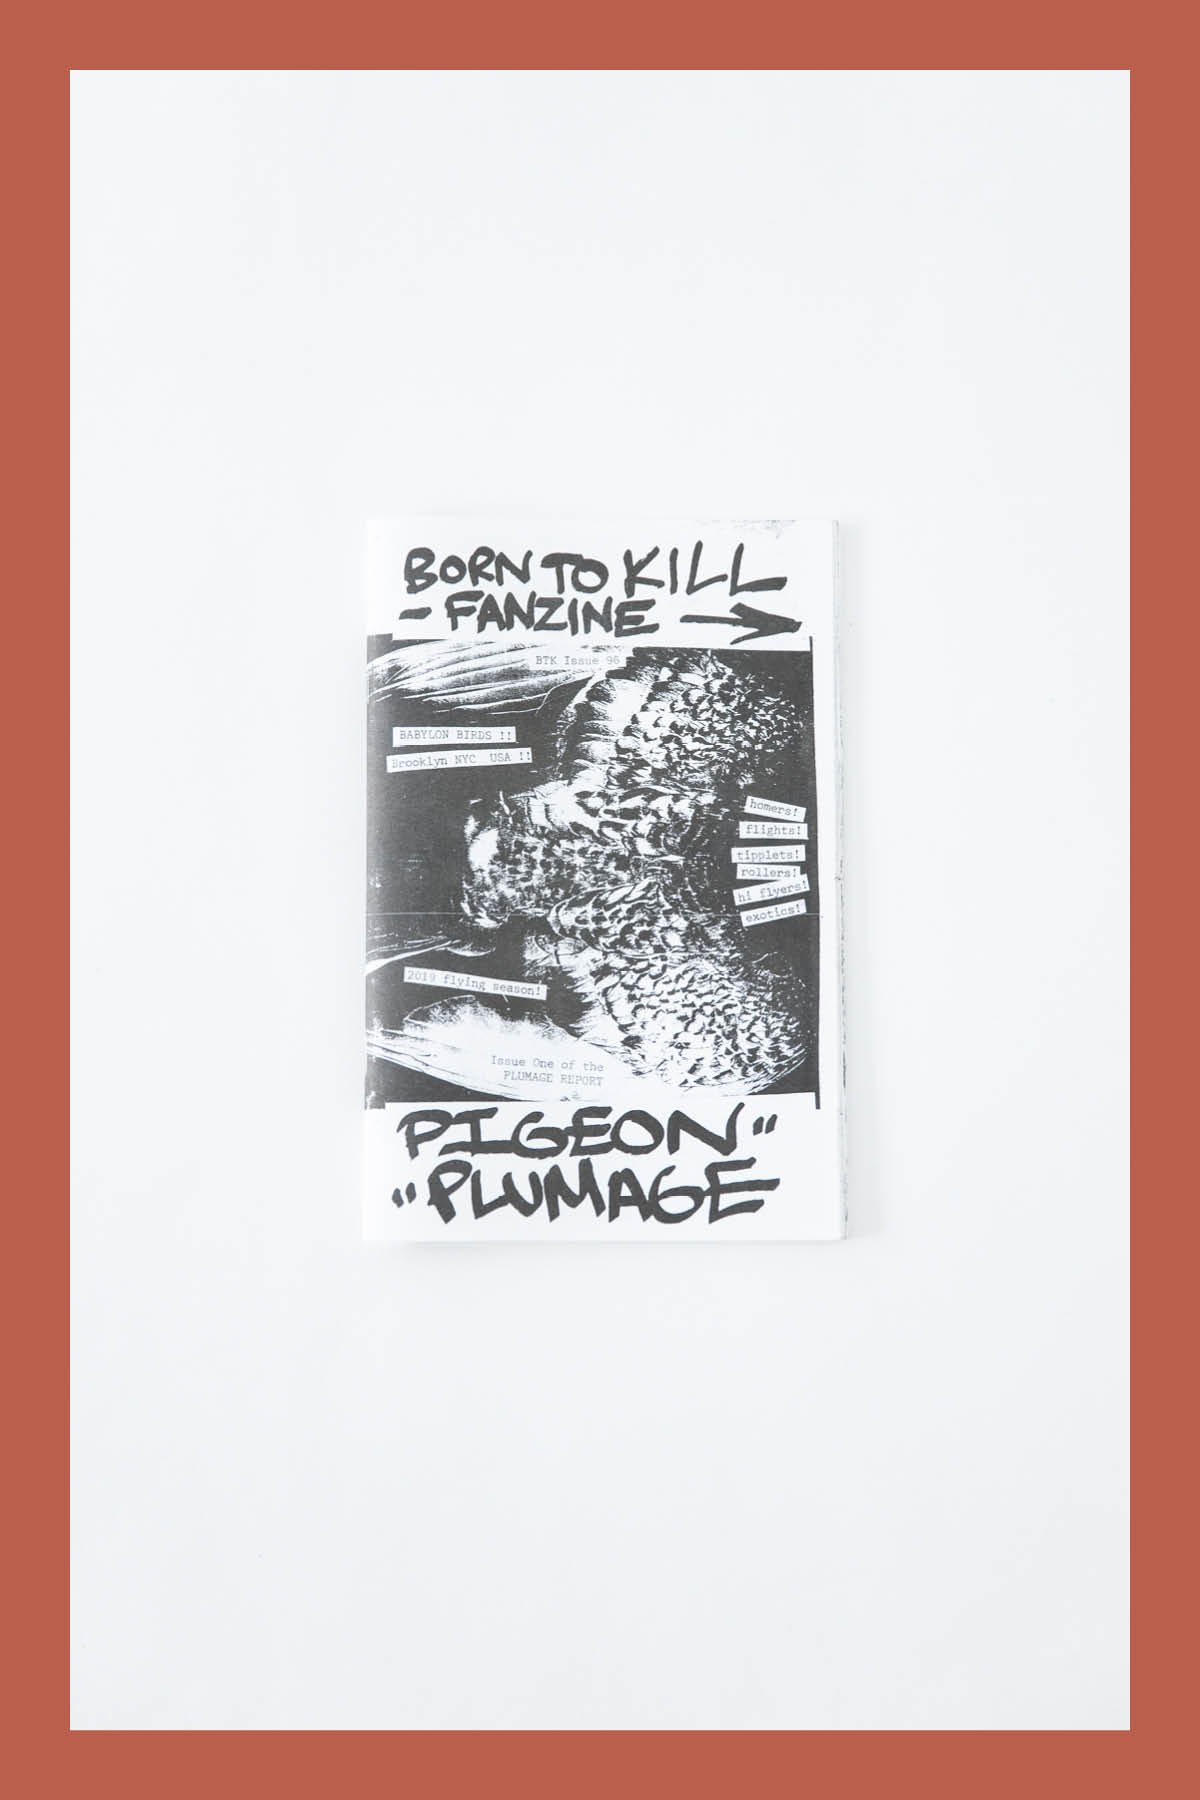 Pat McCarthy / BORN TO KILL ZINE #1